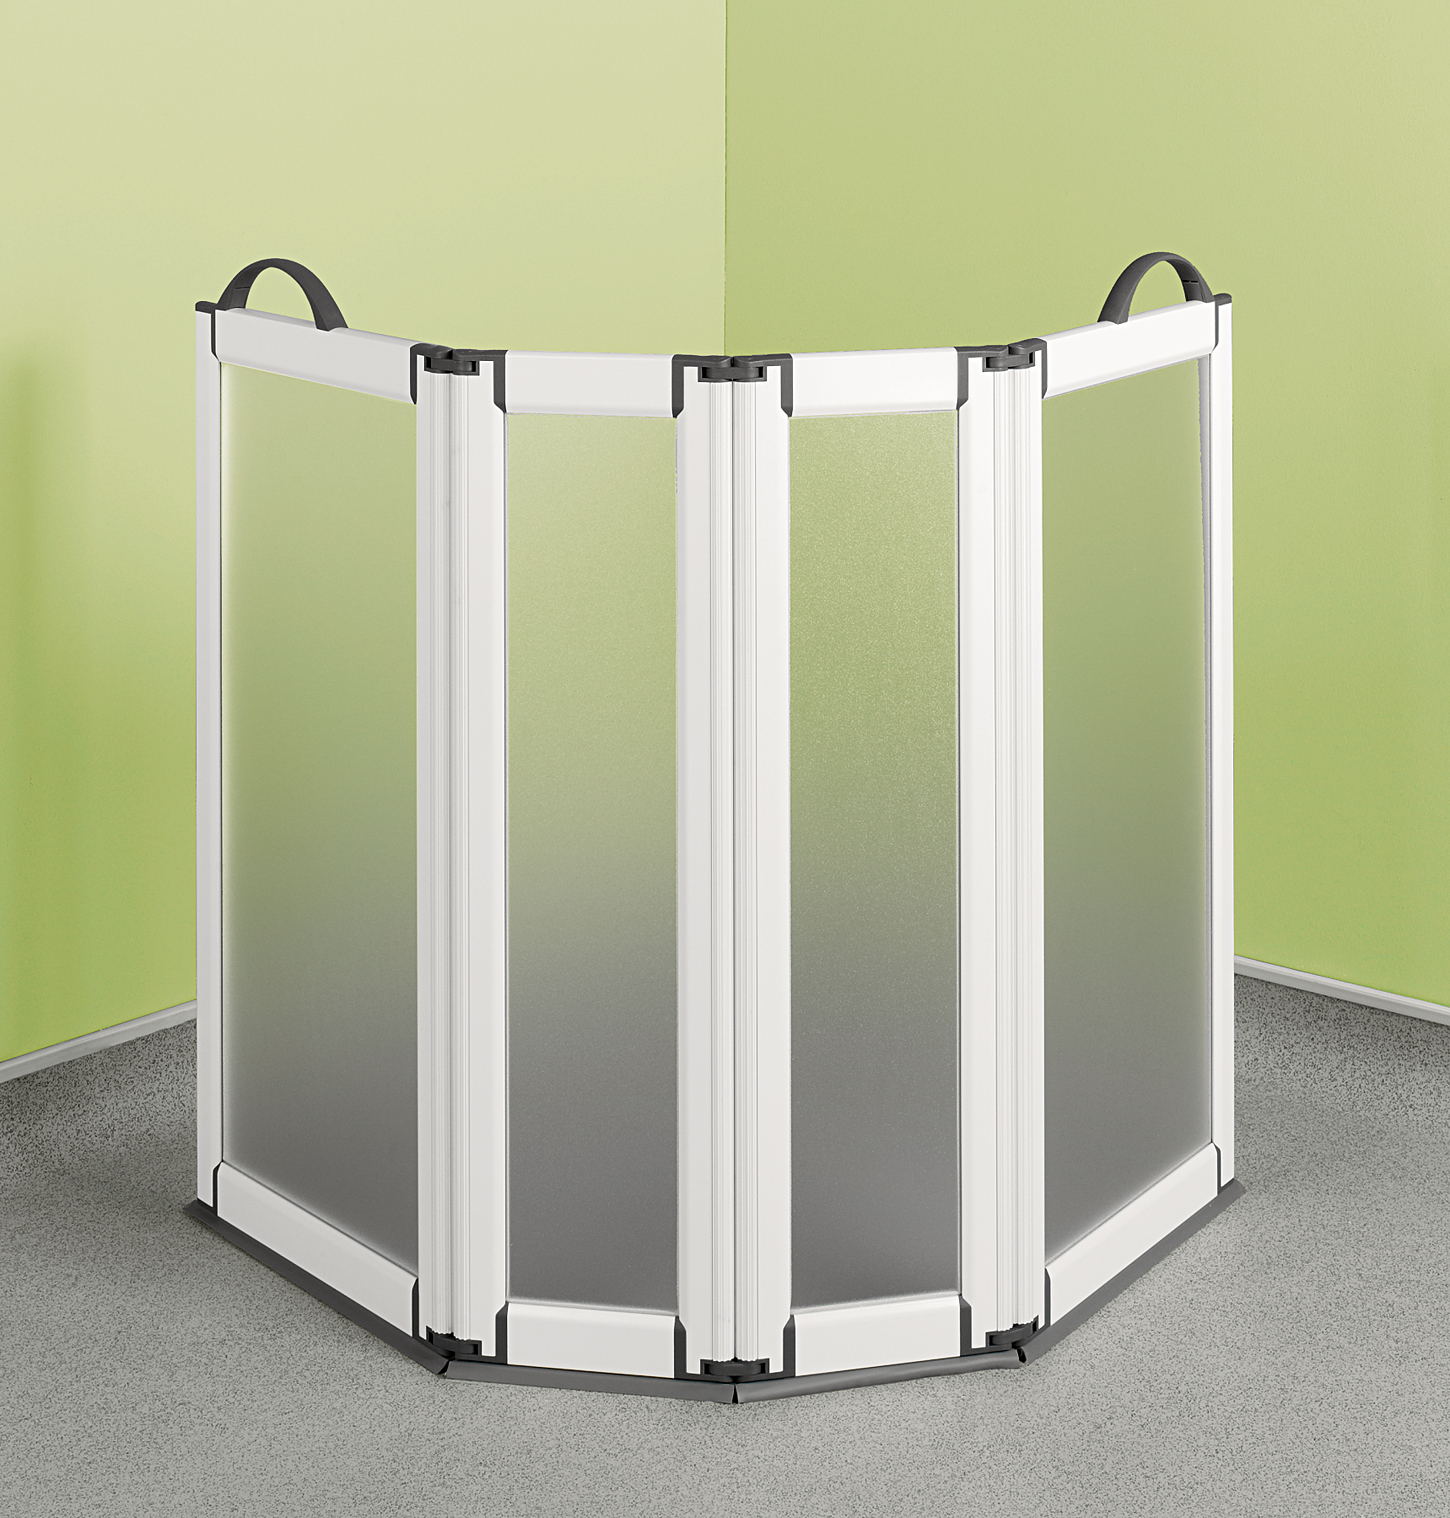 Half Height Shower Doors By Impey Practical Bathing